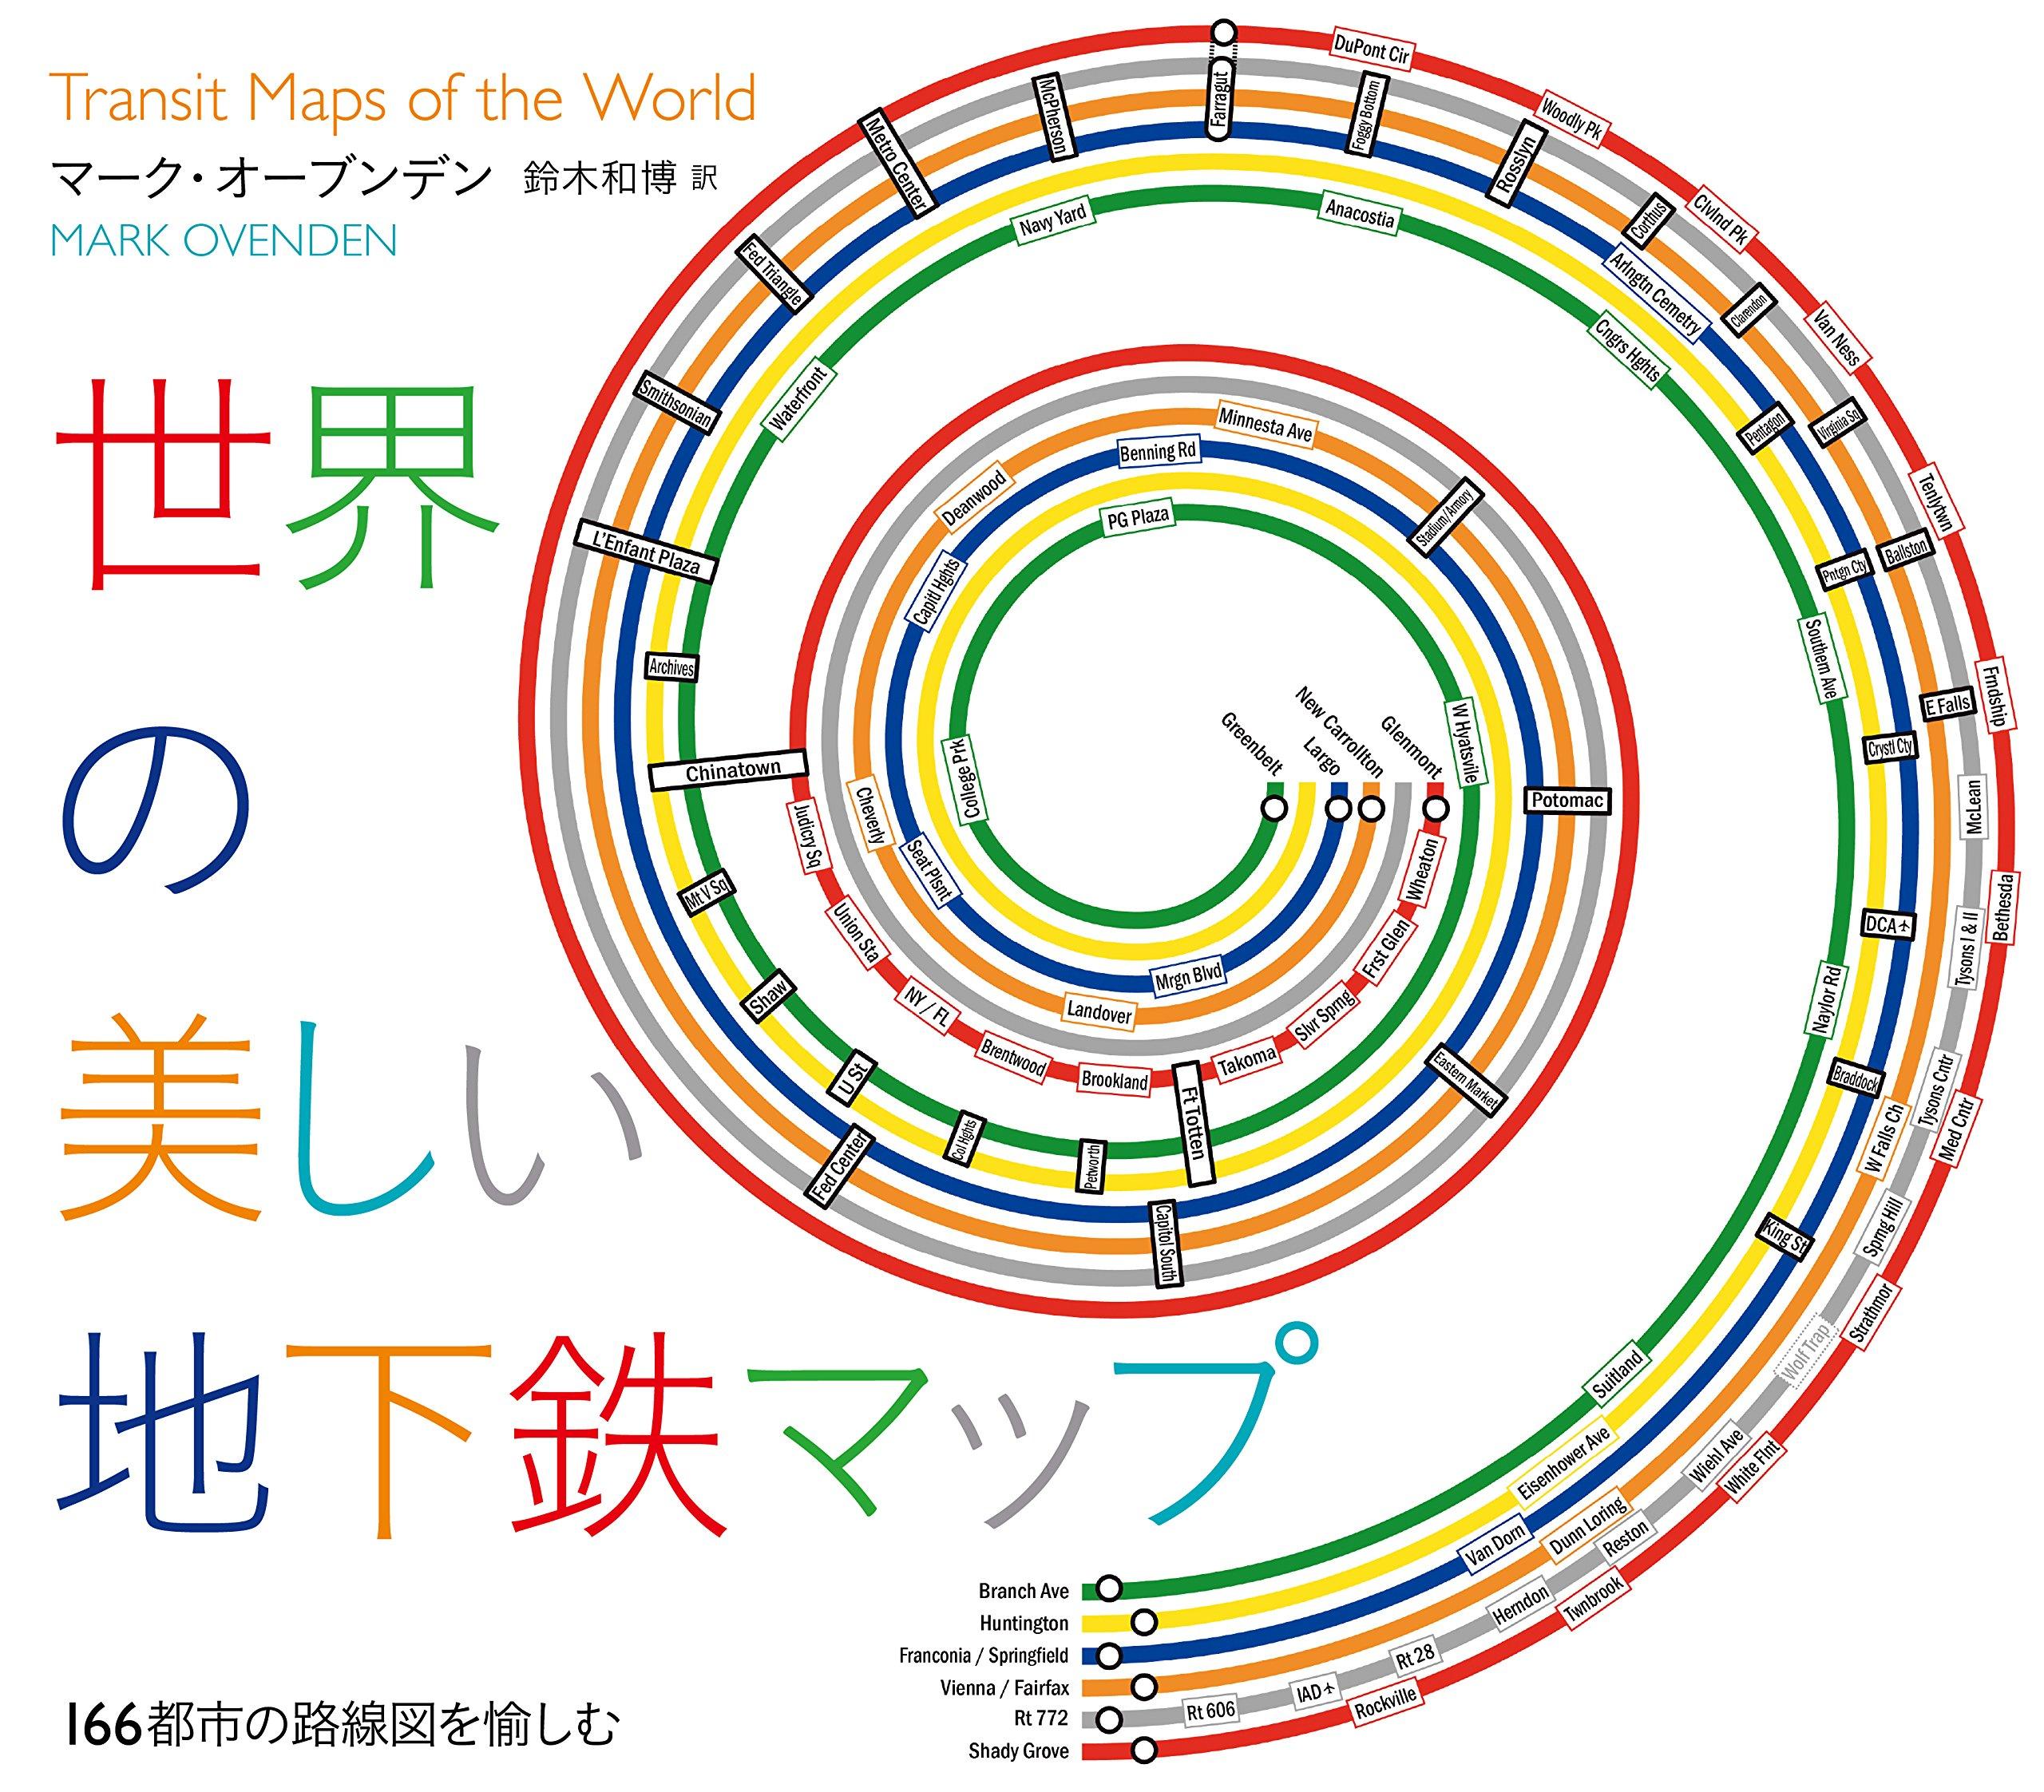 大阪 メトロ 路線 図 地下鉄